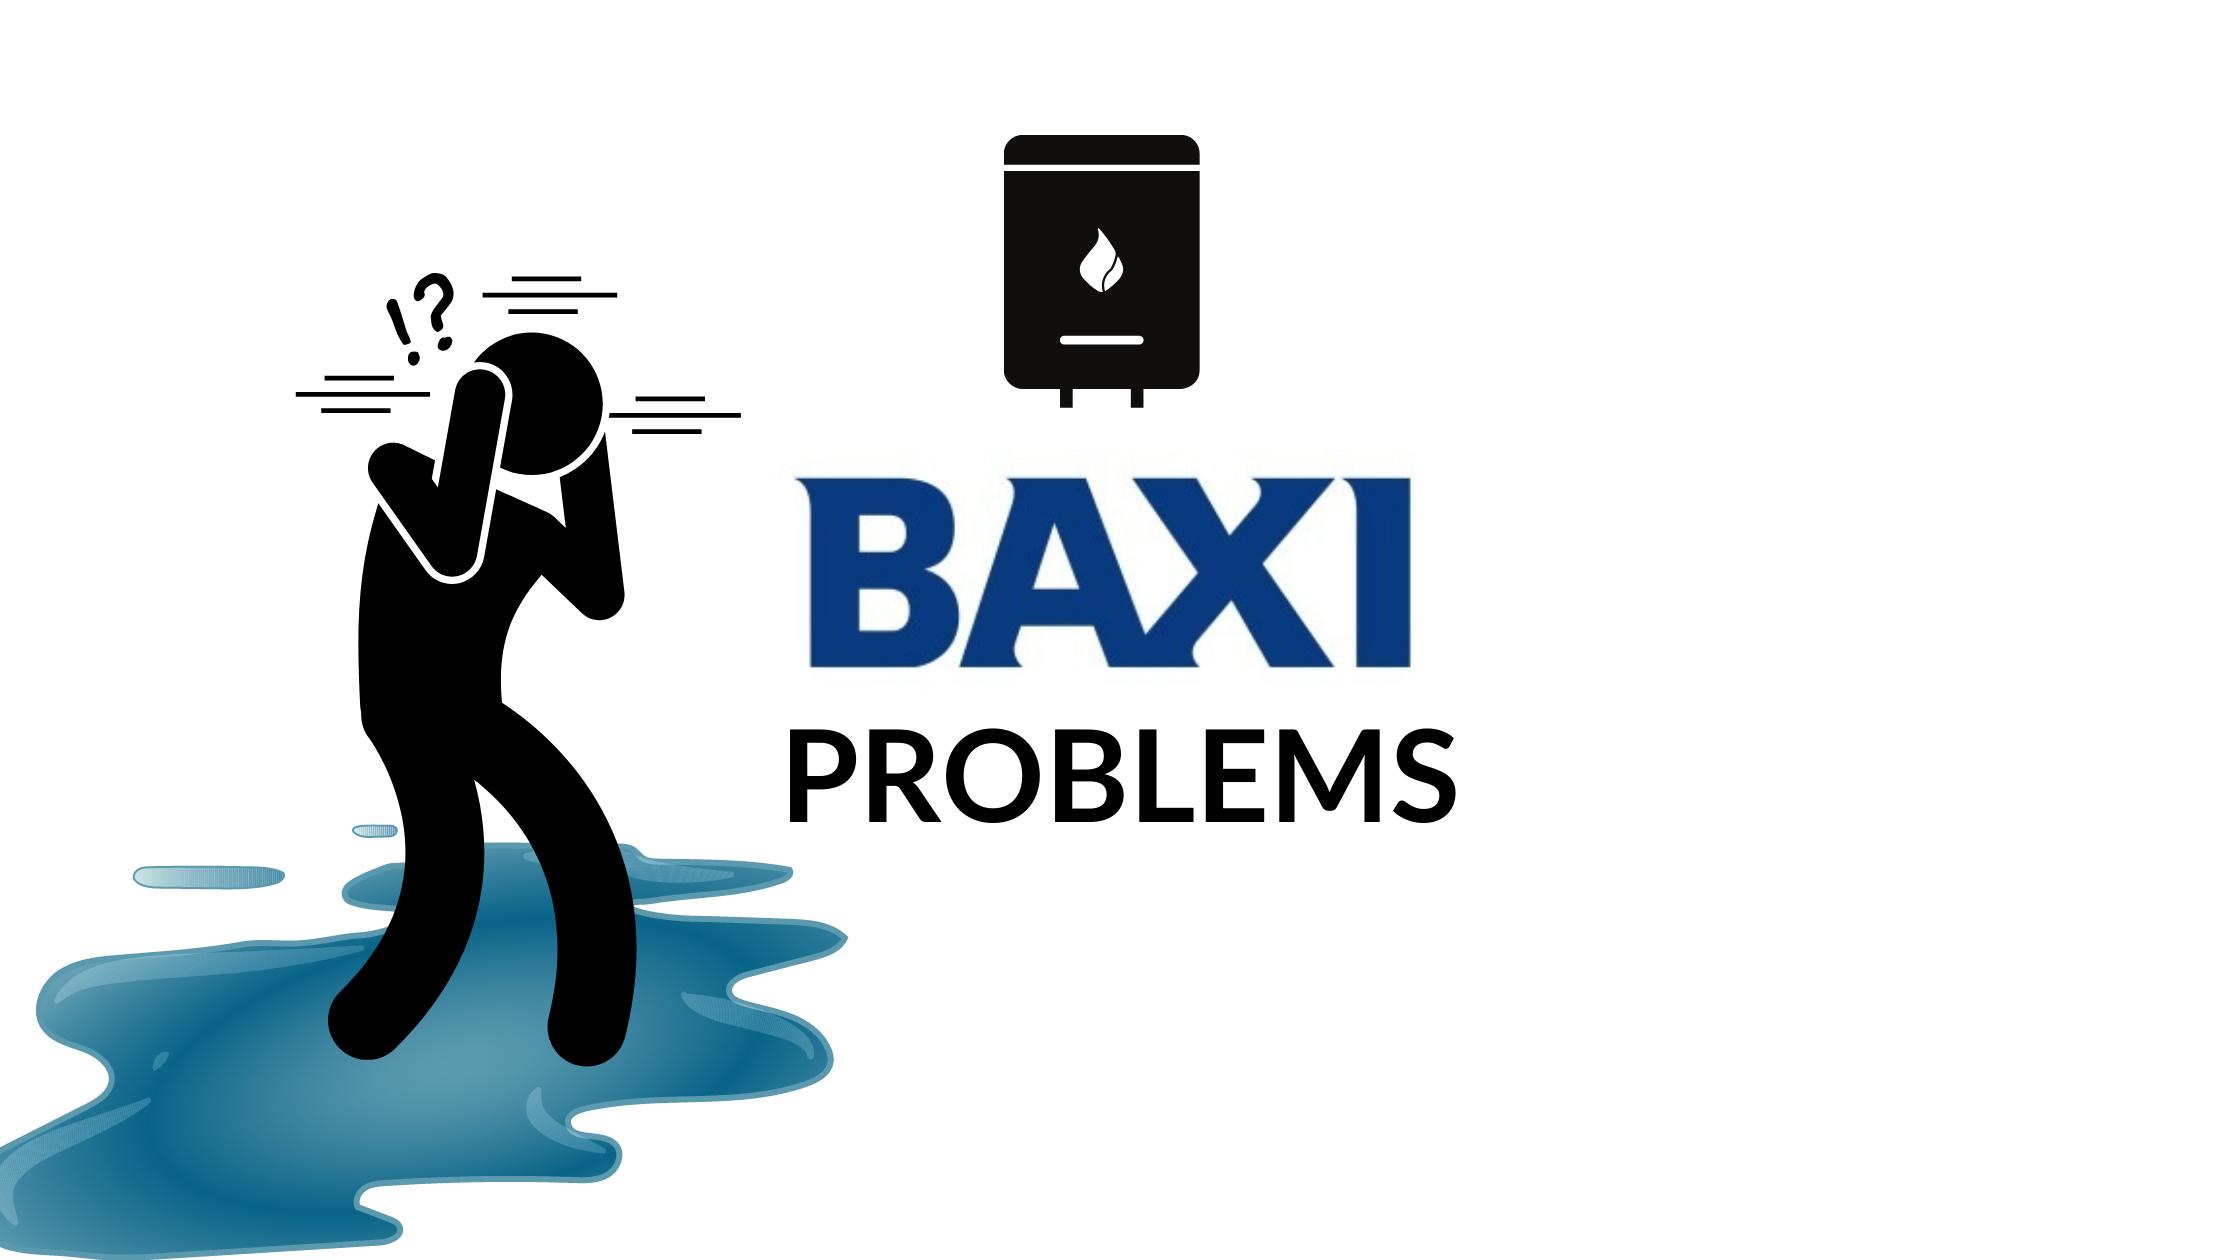 baxi boiler problems